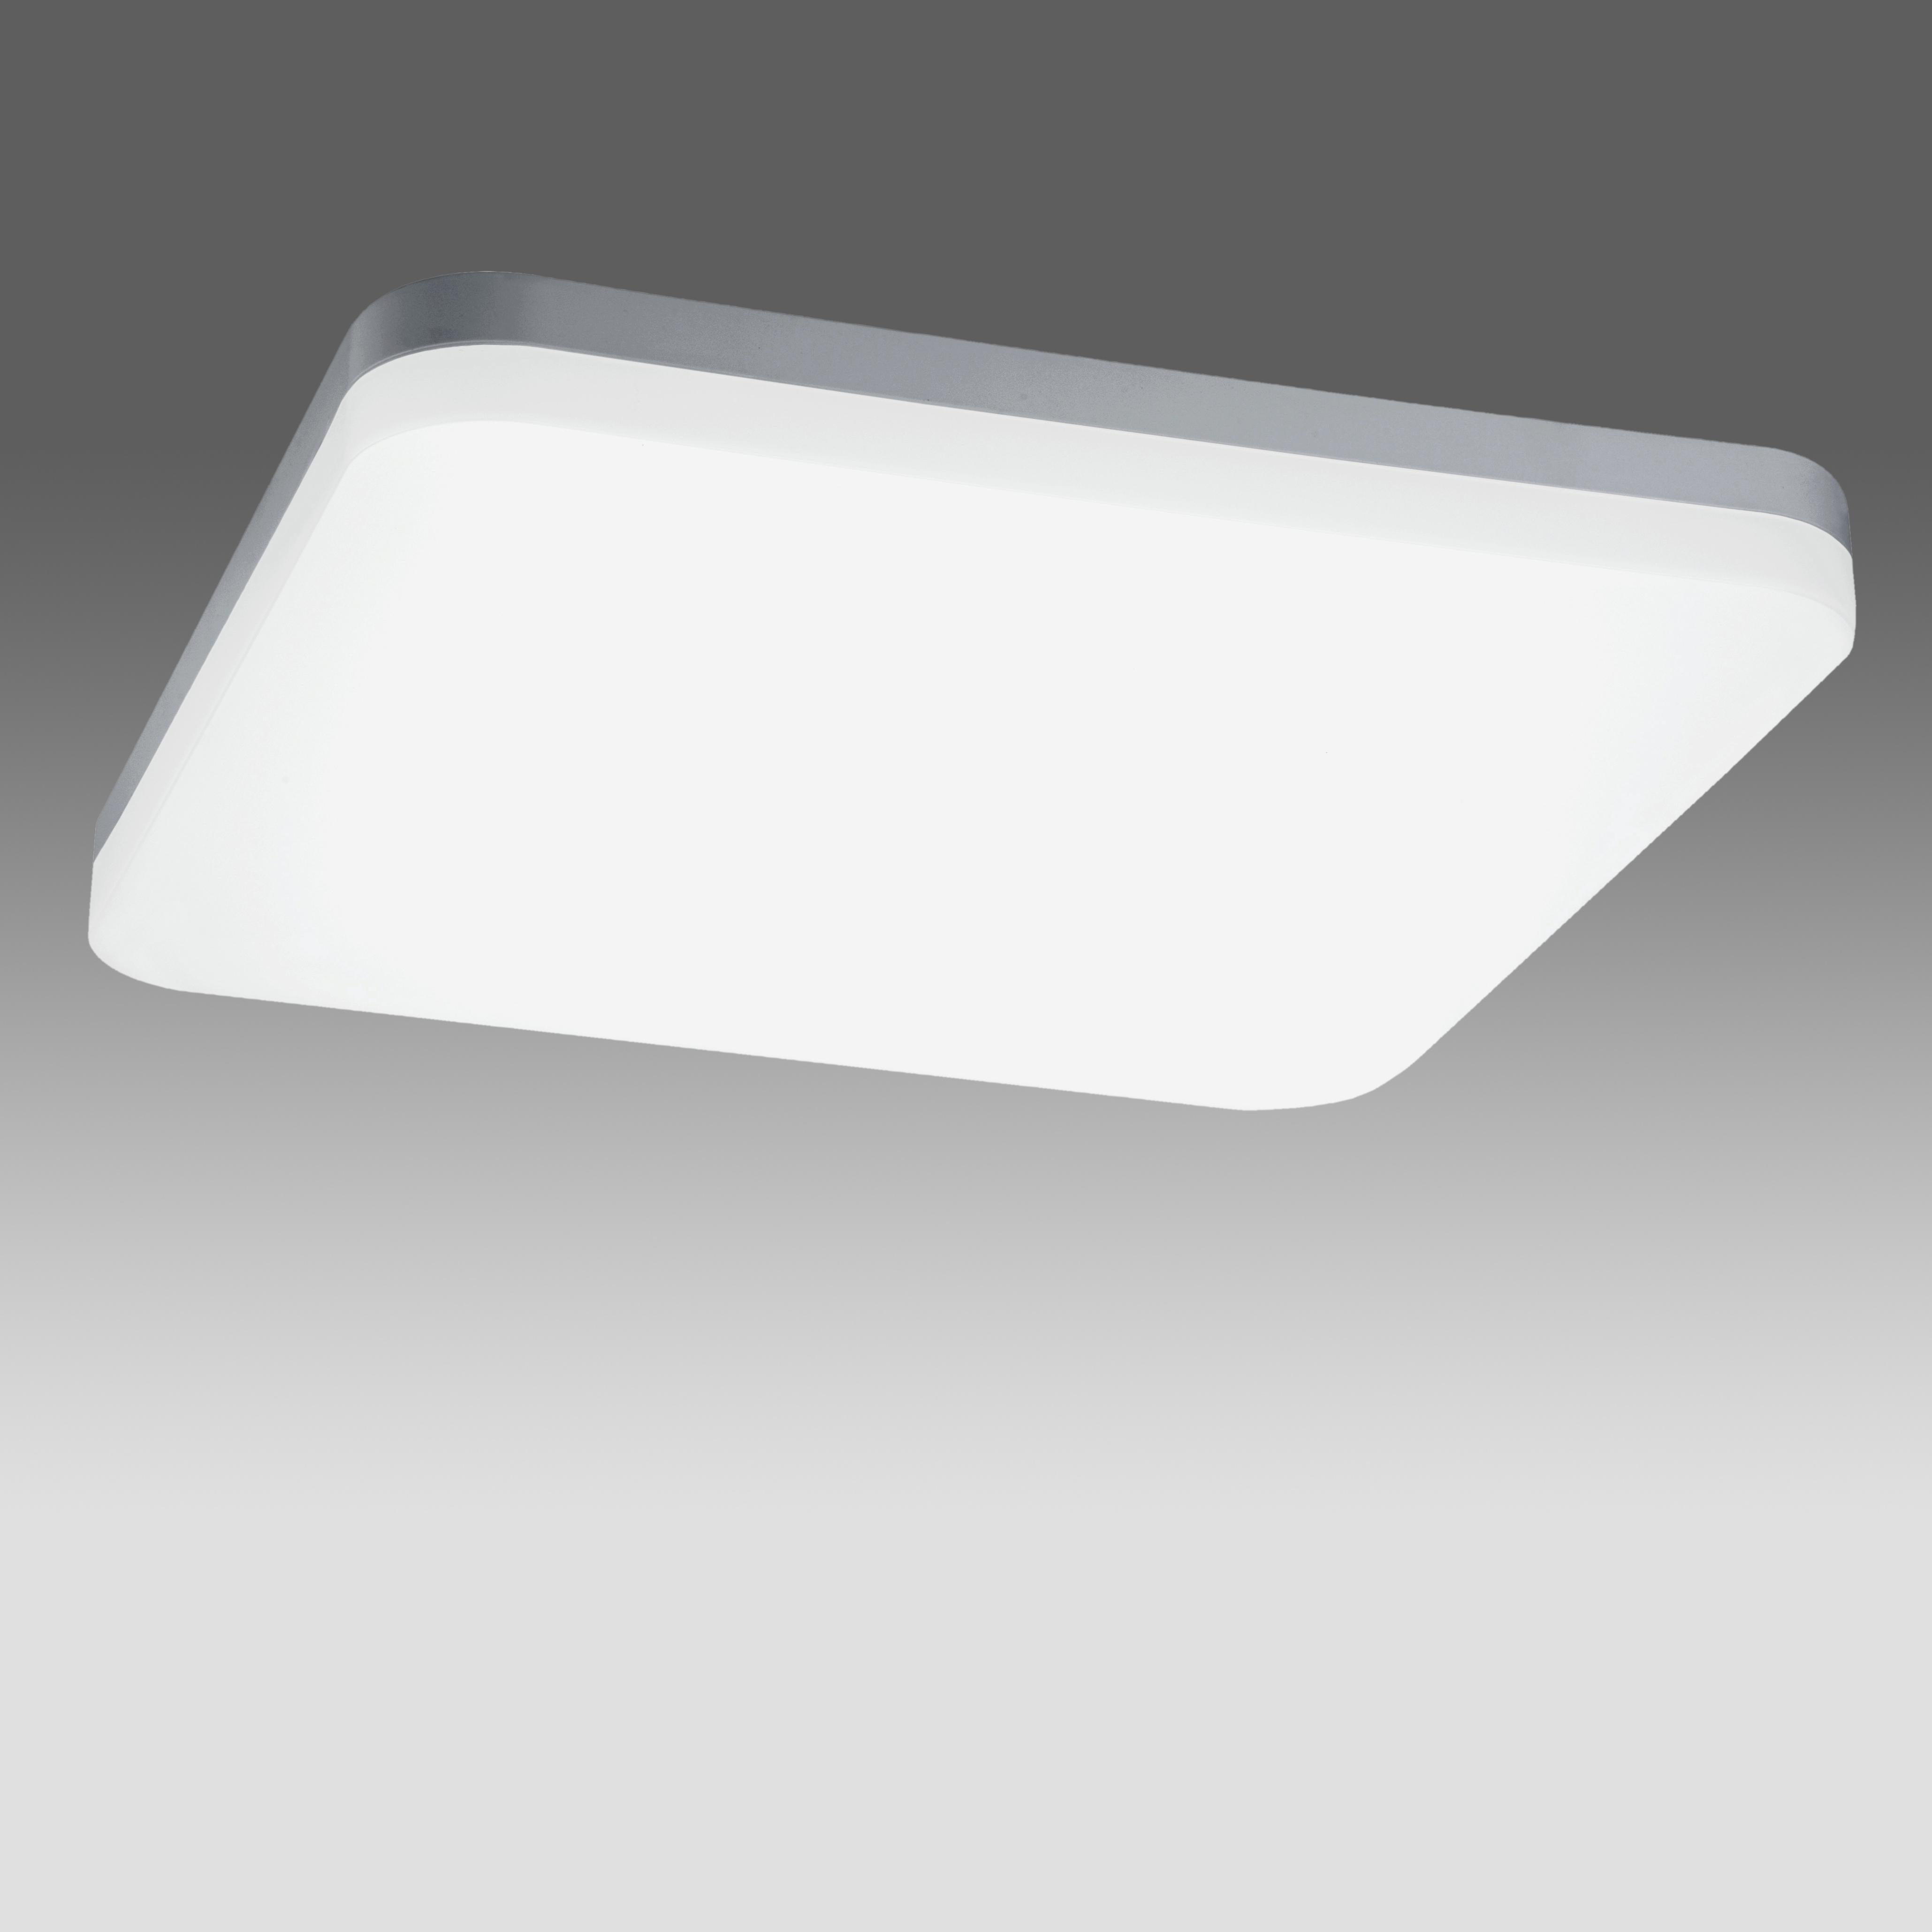 1 Stk Elegance Square IV 37W 3700lm 4000K Triac Dim IP20 silber LILE0048--